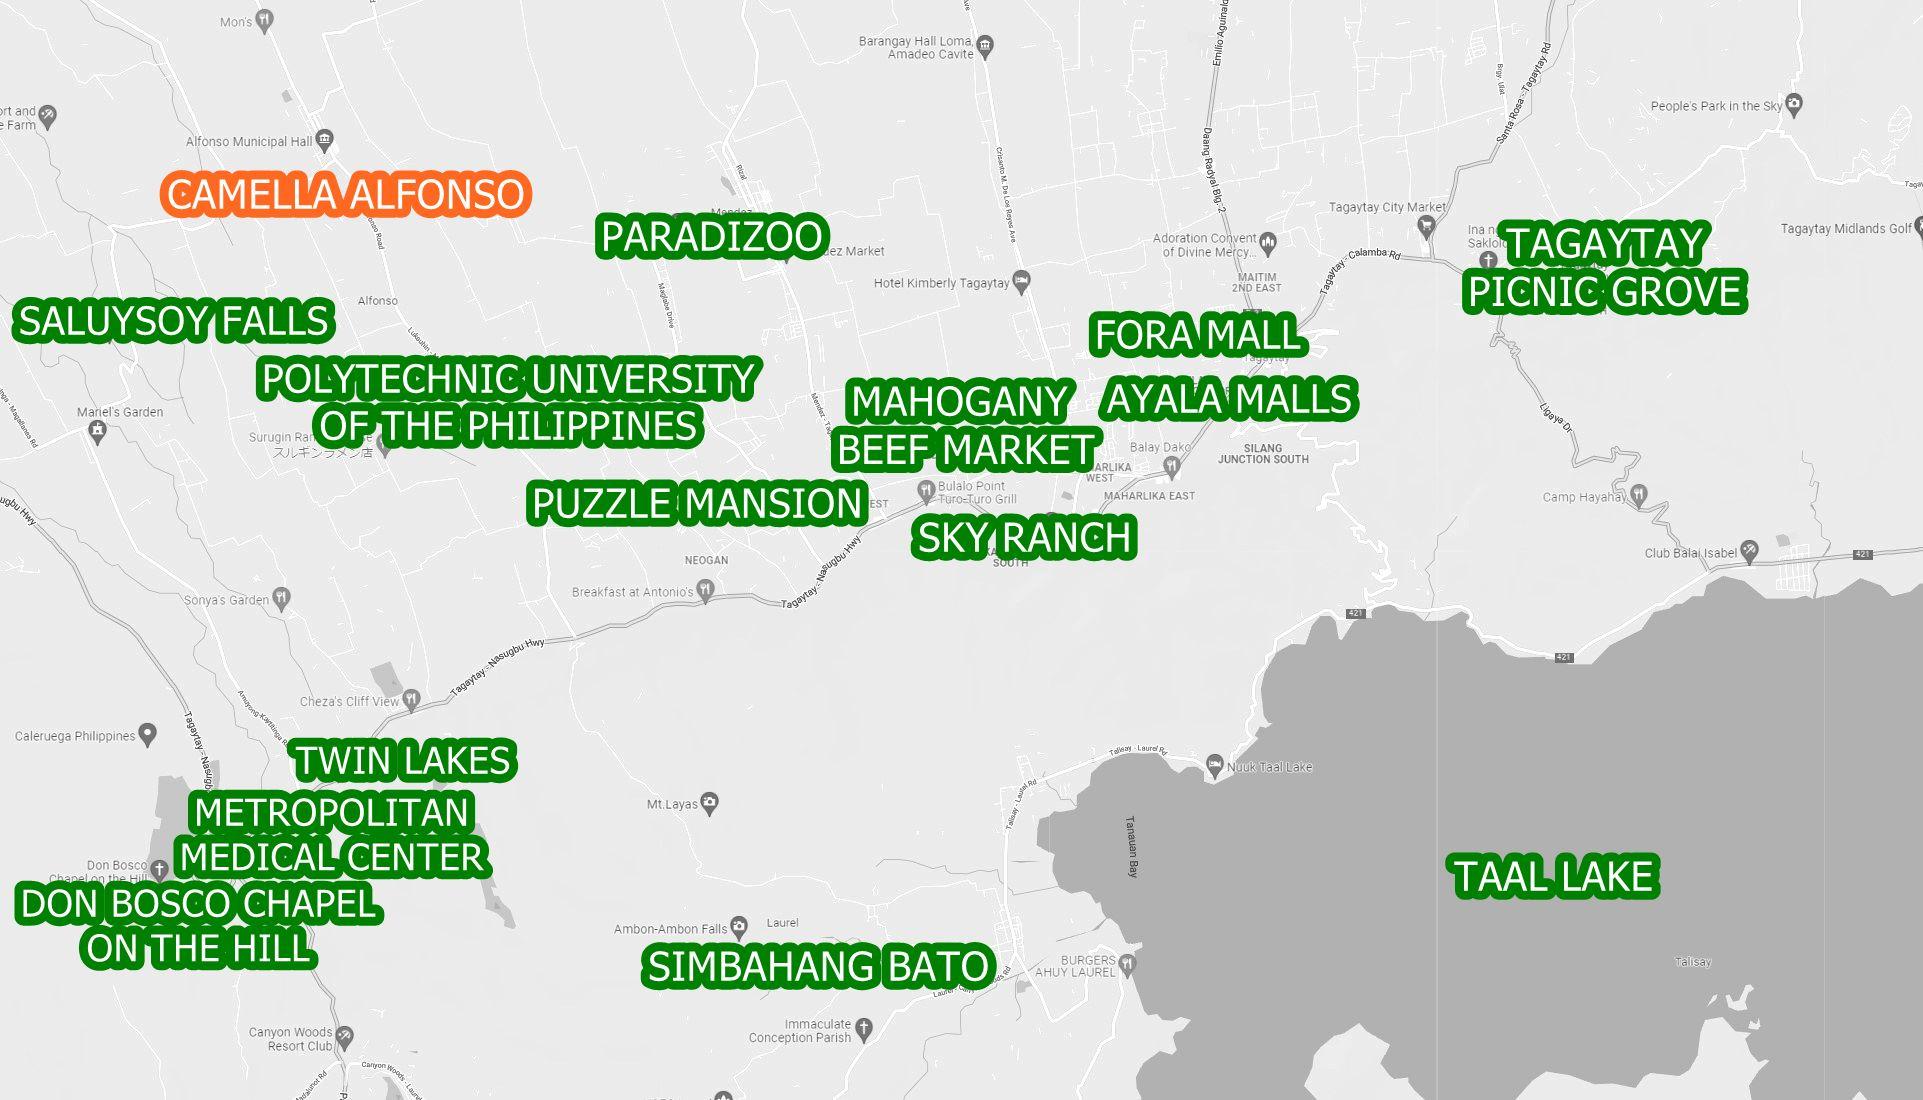 Alfonso Property Vicinity Map